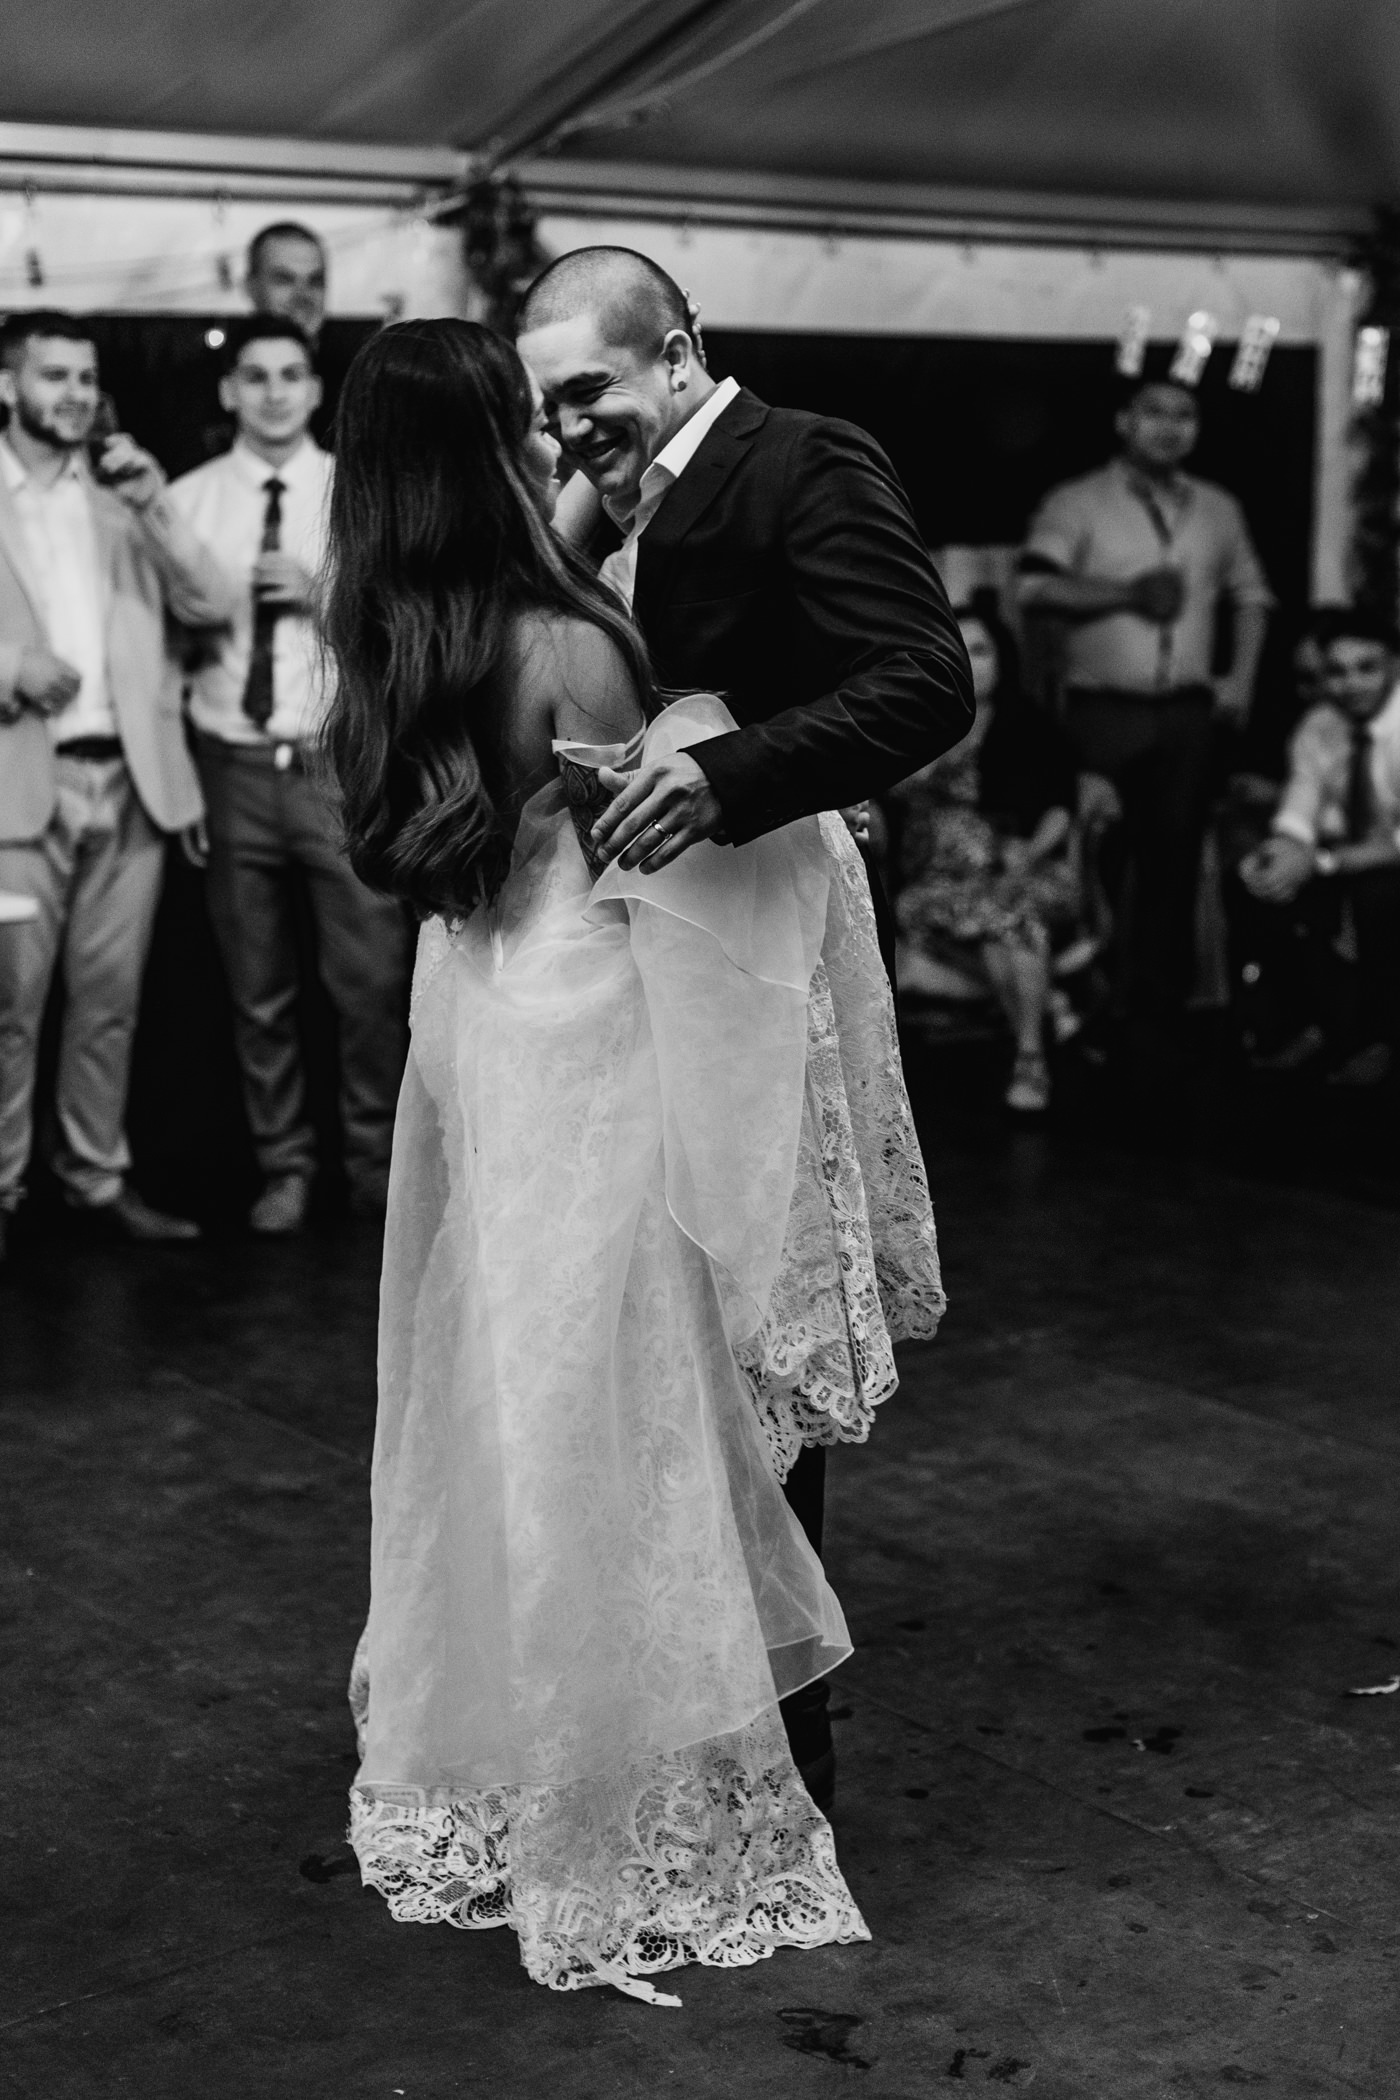 Nick & Vanezza - Fernbank Farm Wedding - Samantha Heather Photography-168.jpg